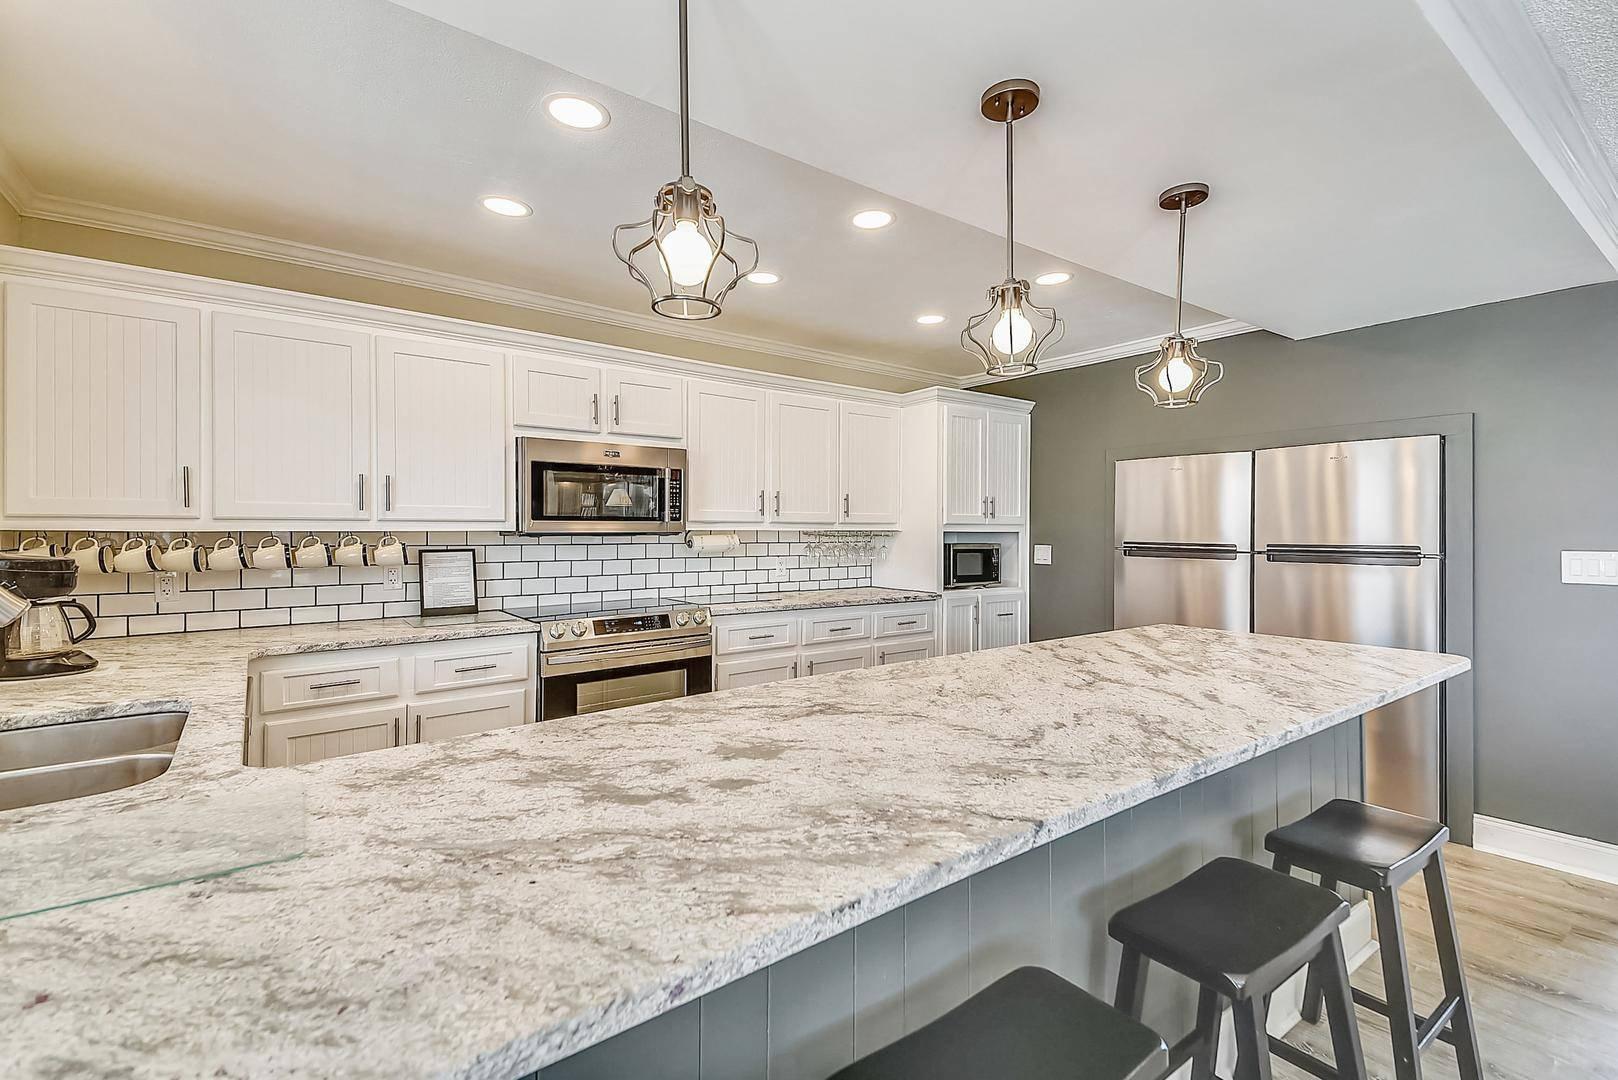 Desiderata West Beach Oak Island Vacation Rental Home with Amazing Kitchen